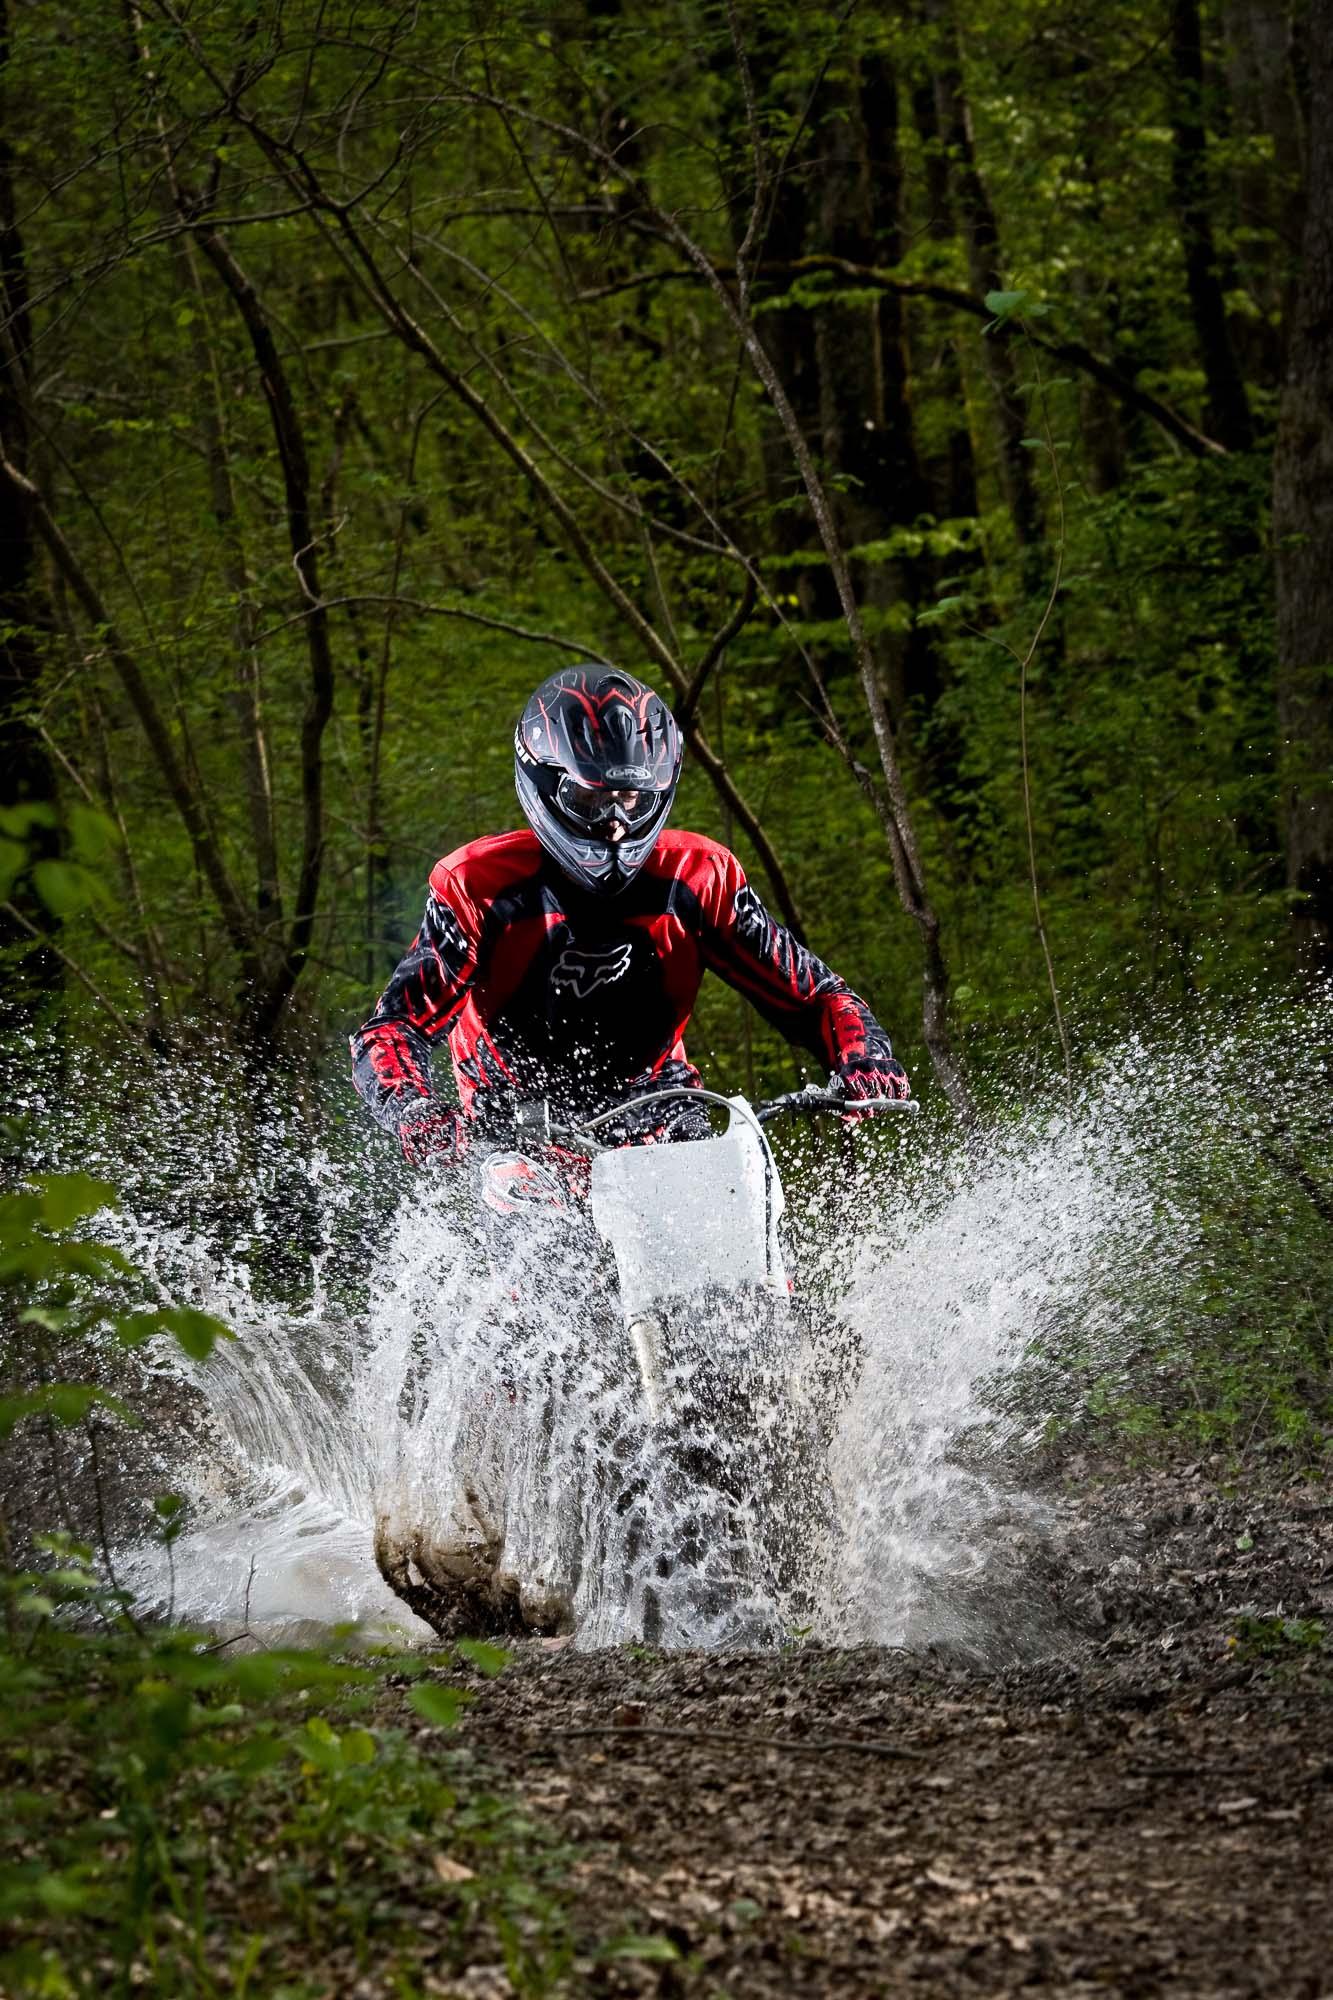 20100425-motos yvoire-2.jpg